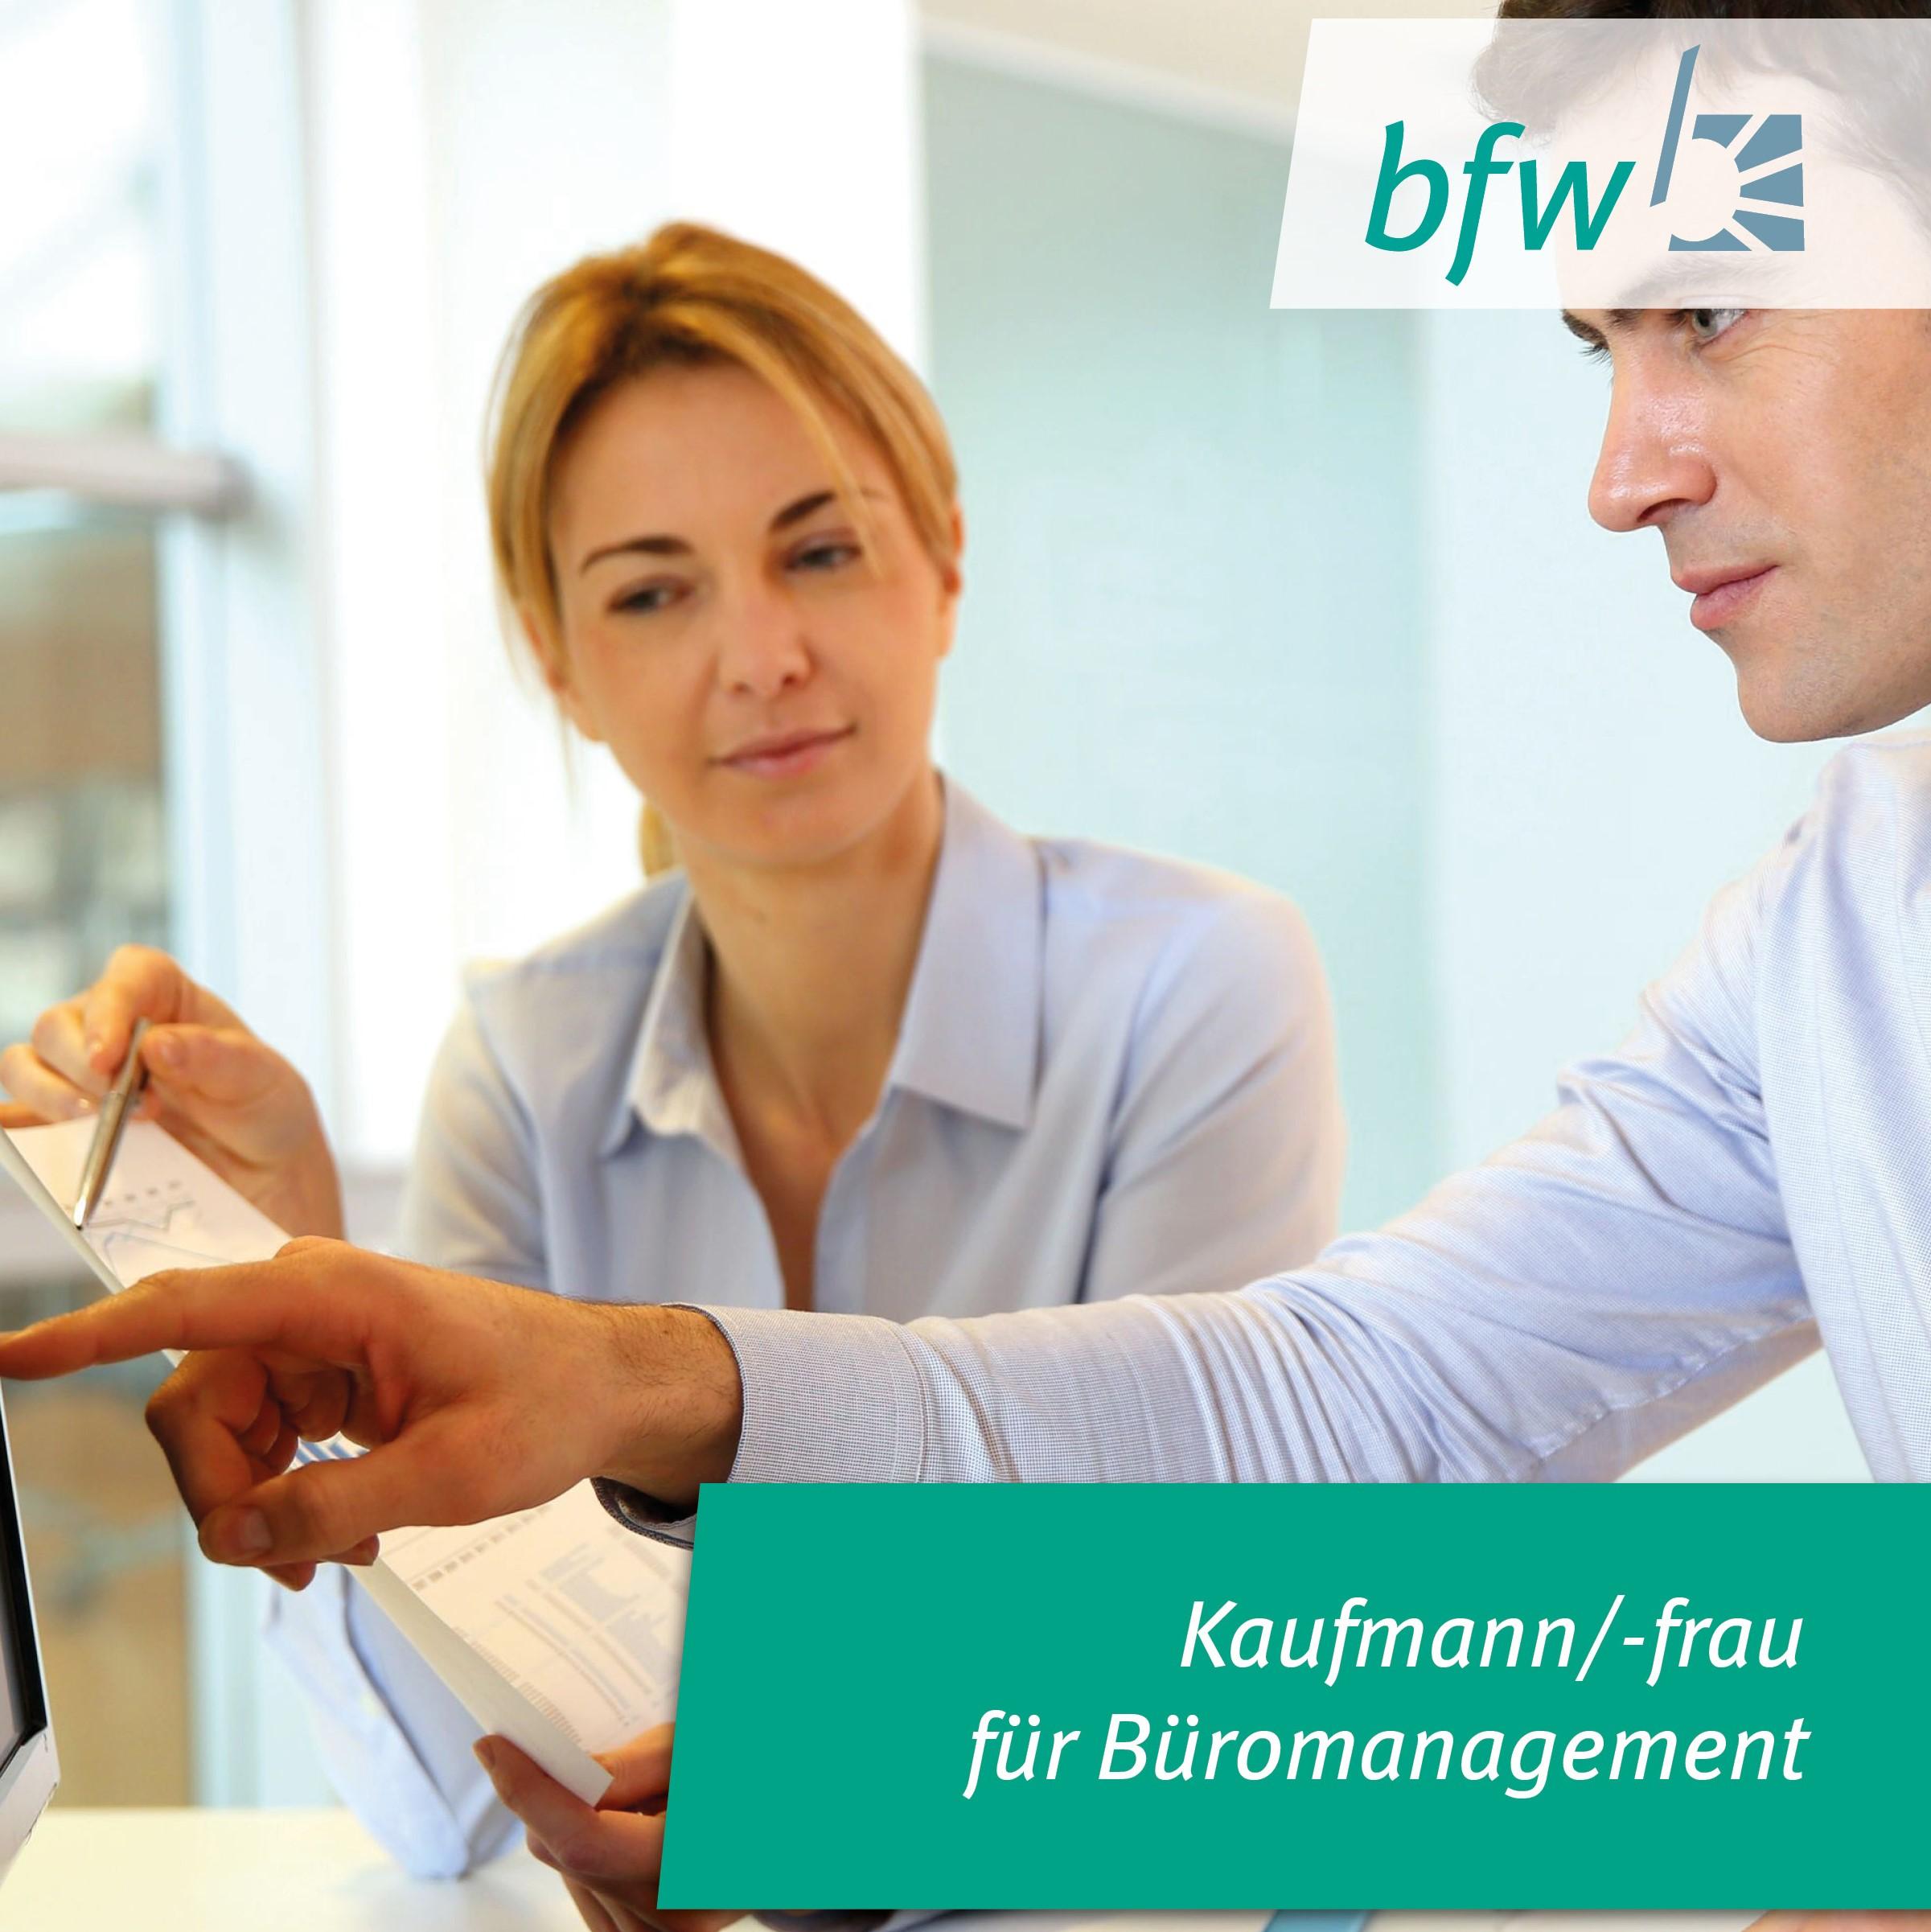 Kaufmann/-frau für Büromanagement Image